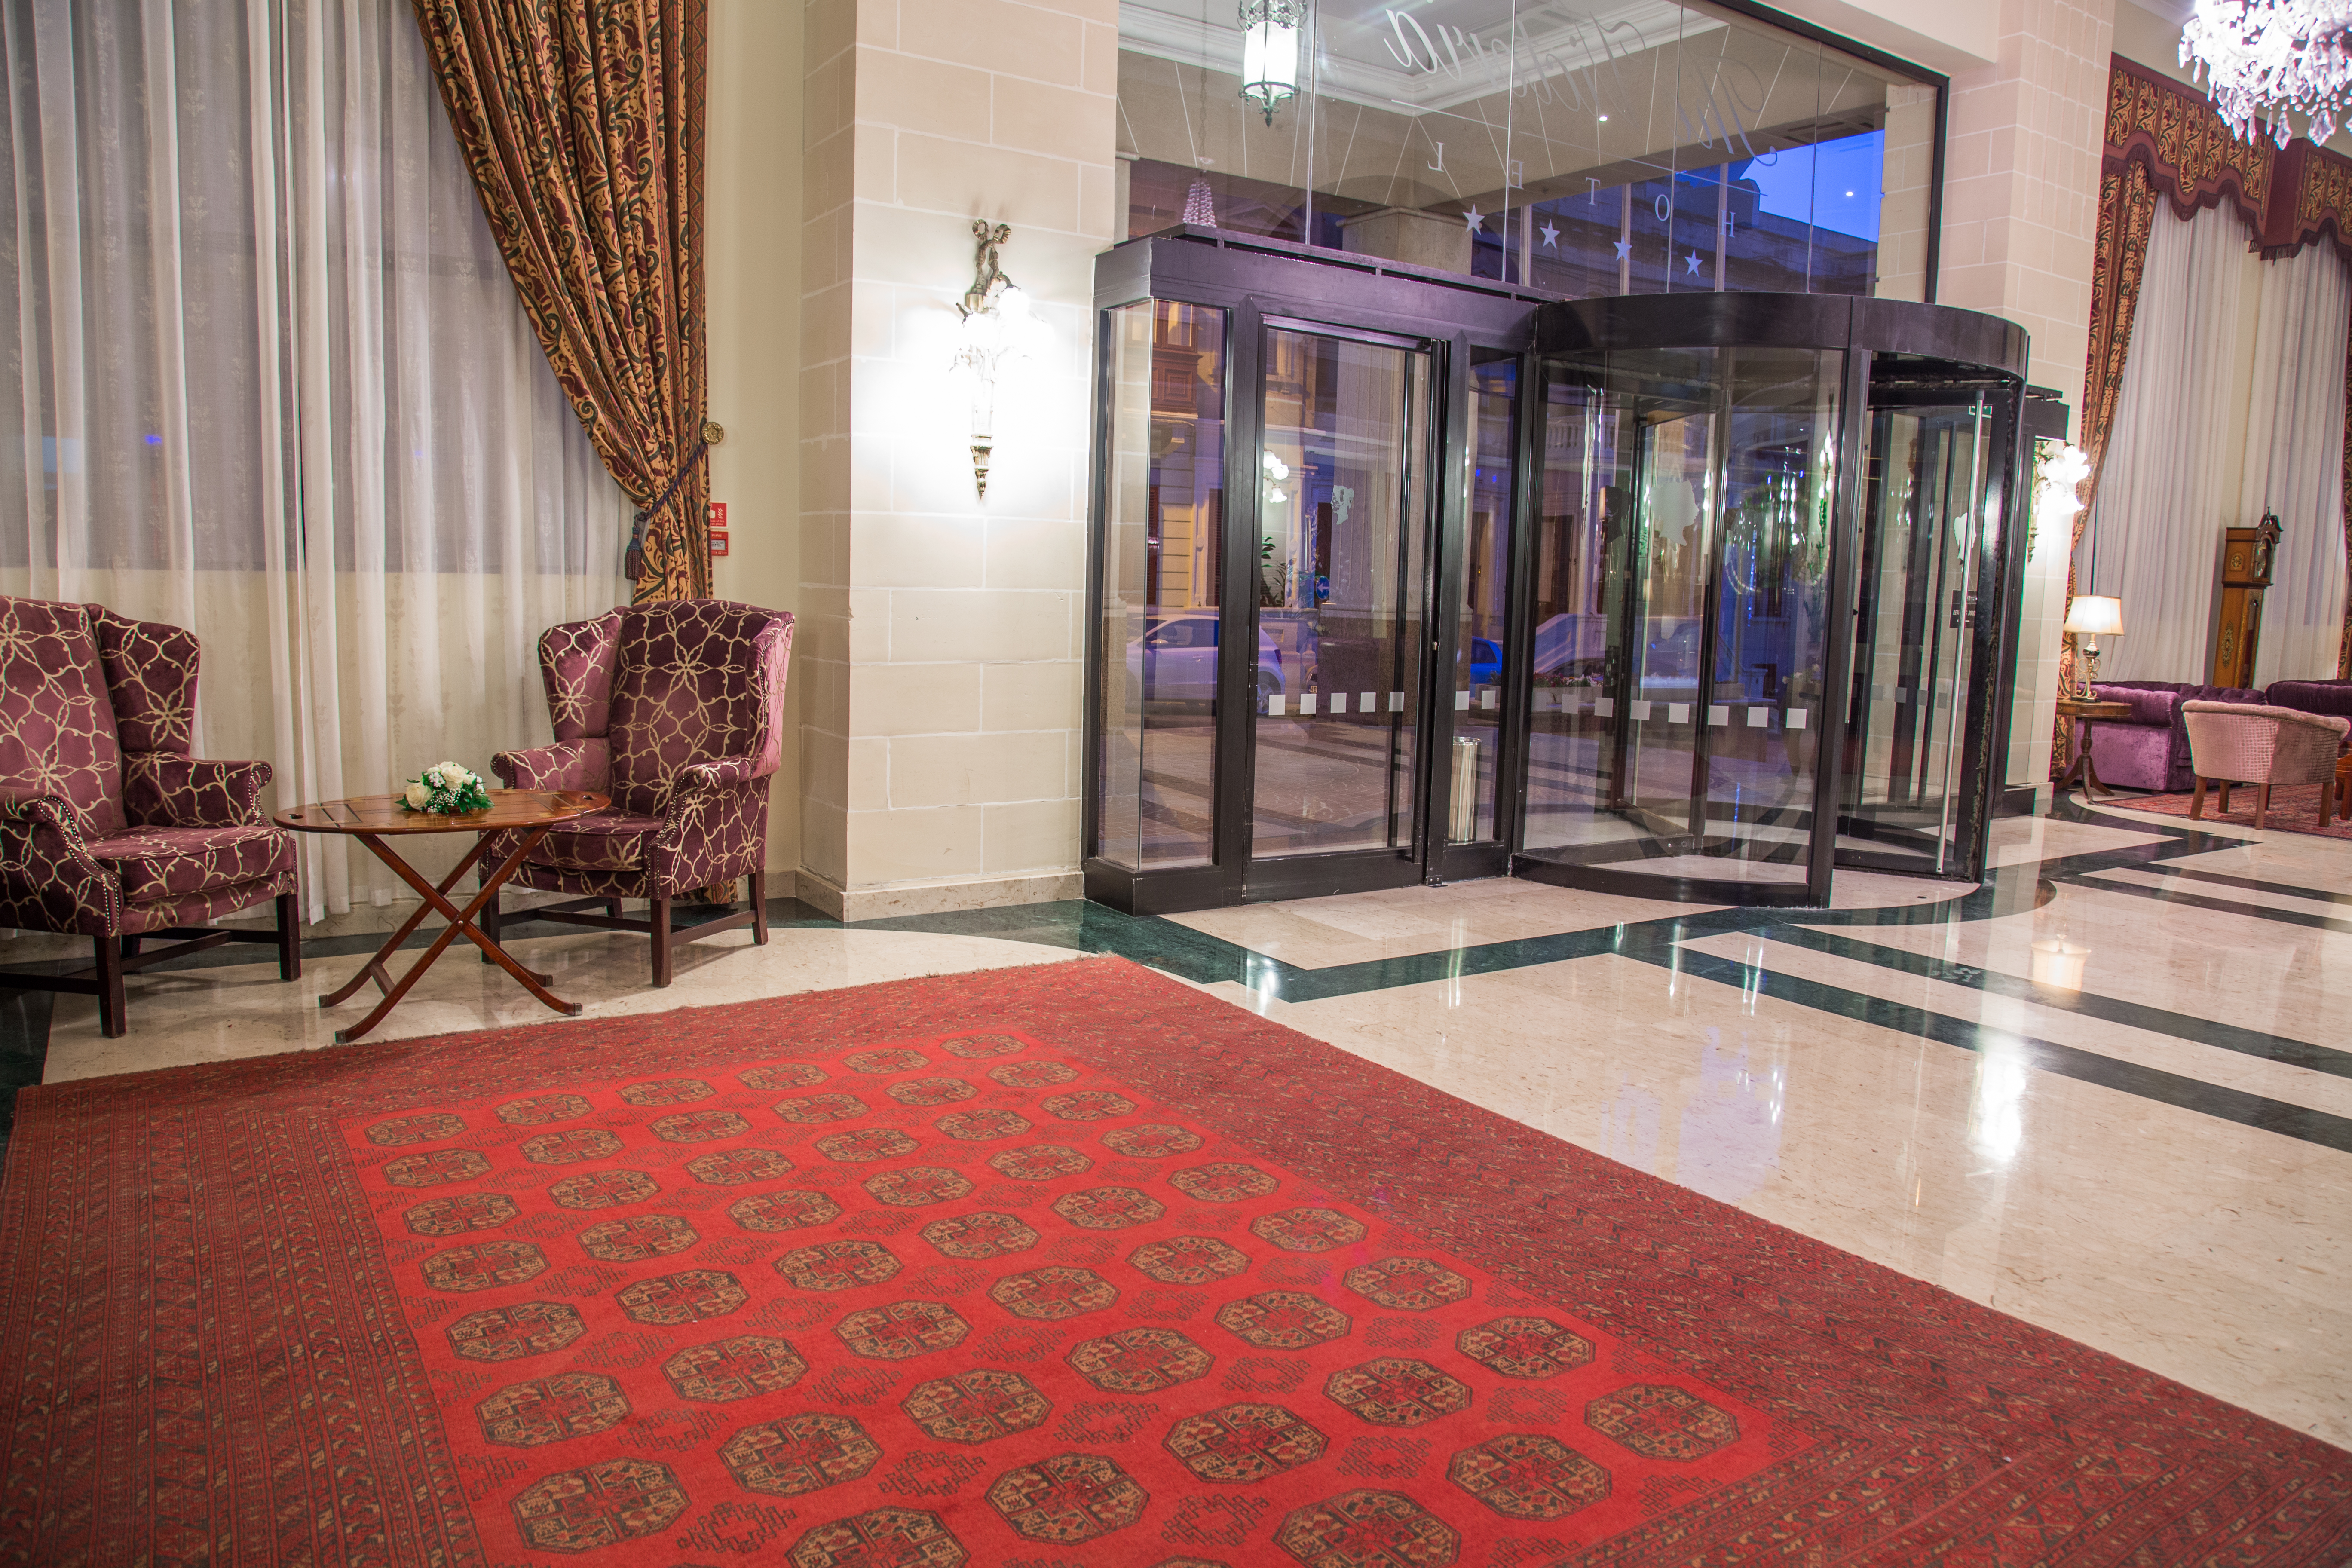 Malta Hotels - Hotels